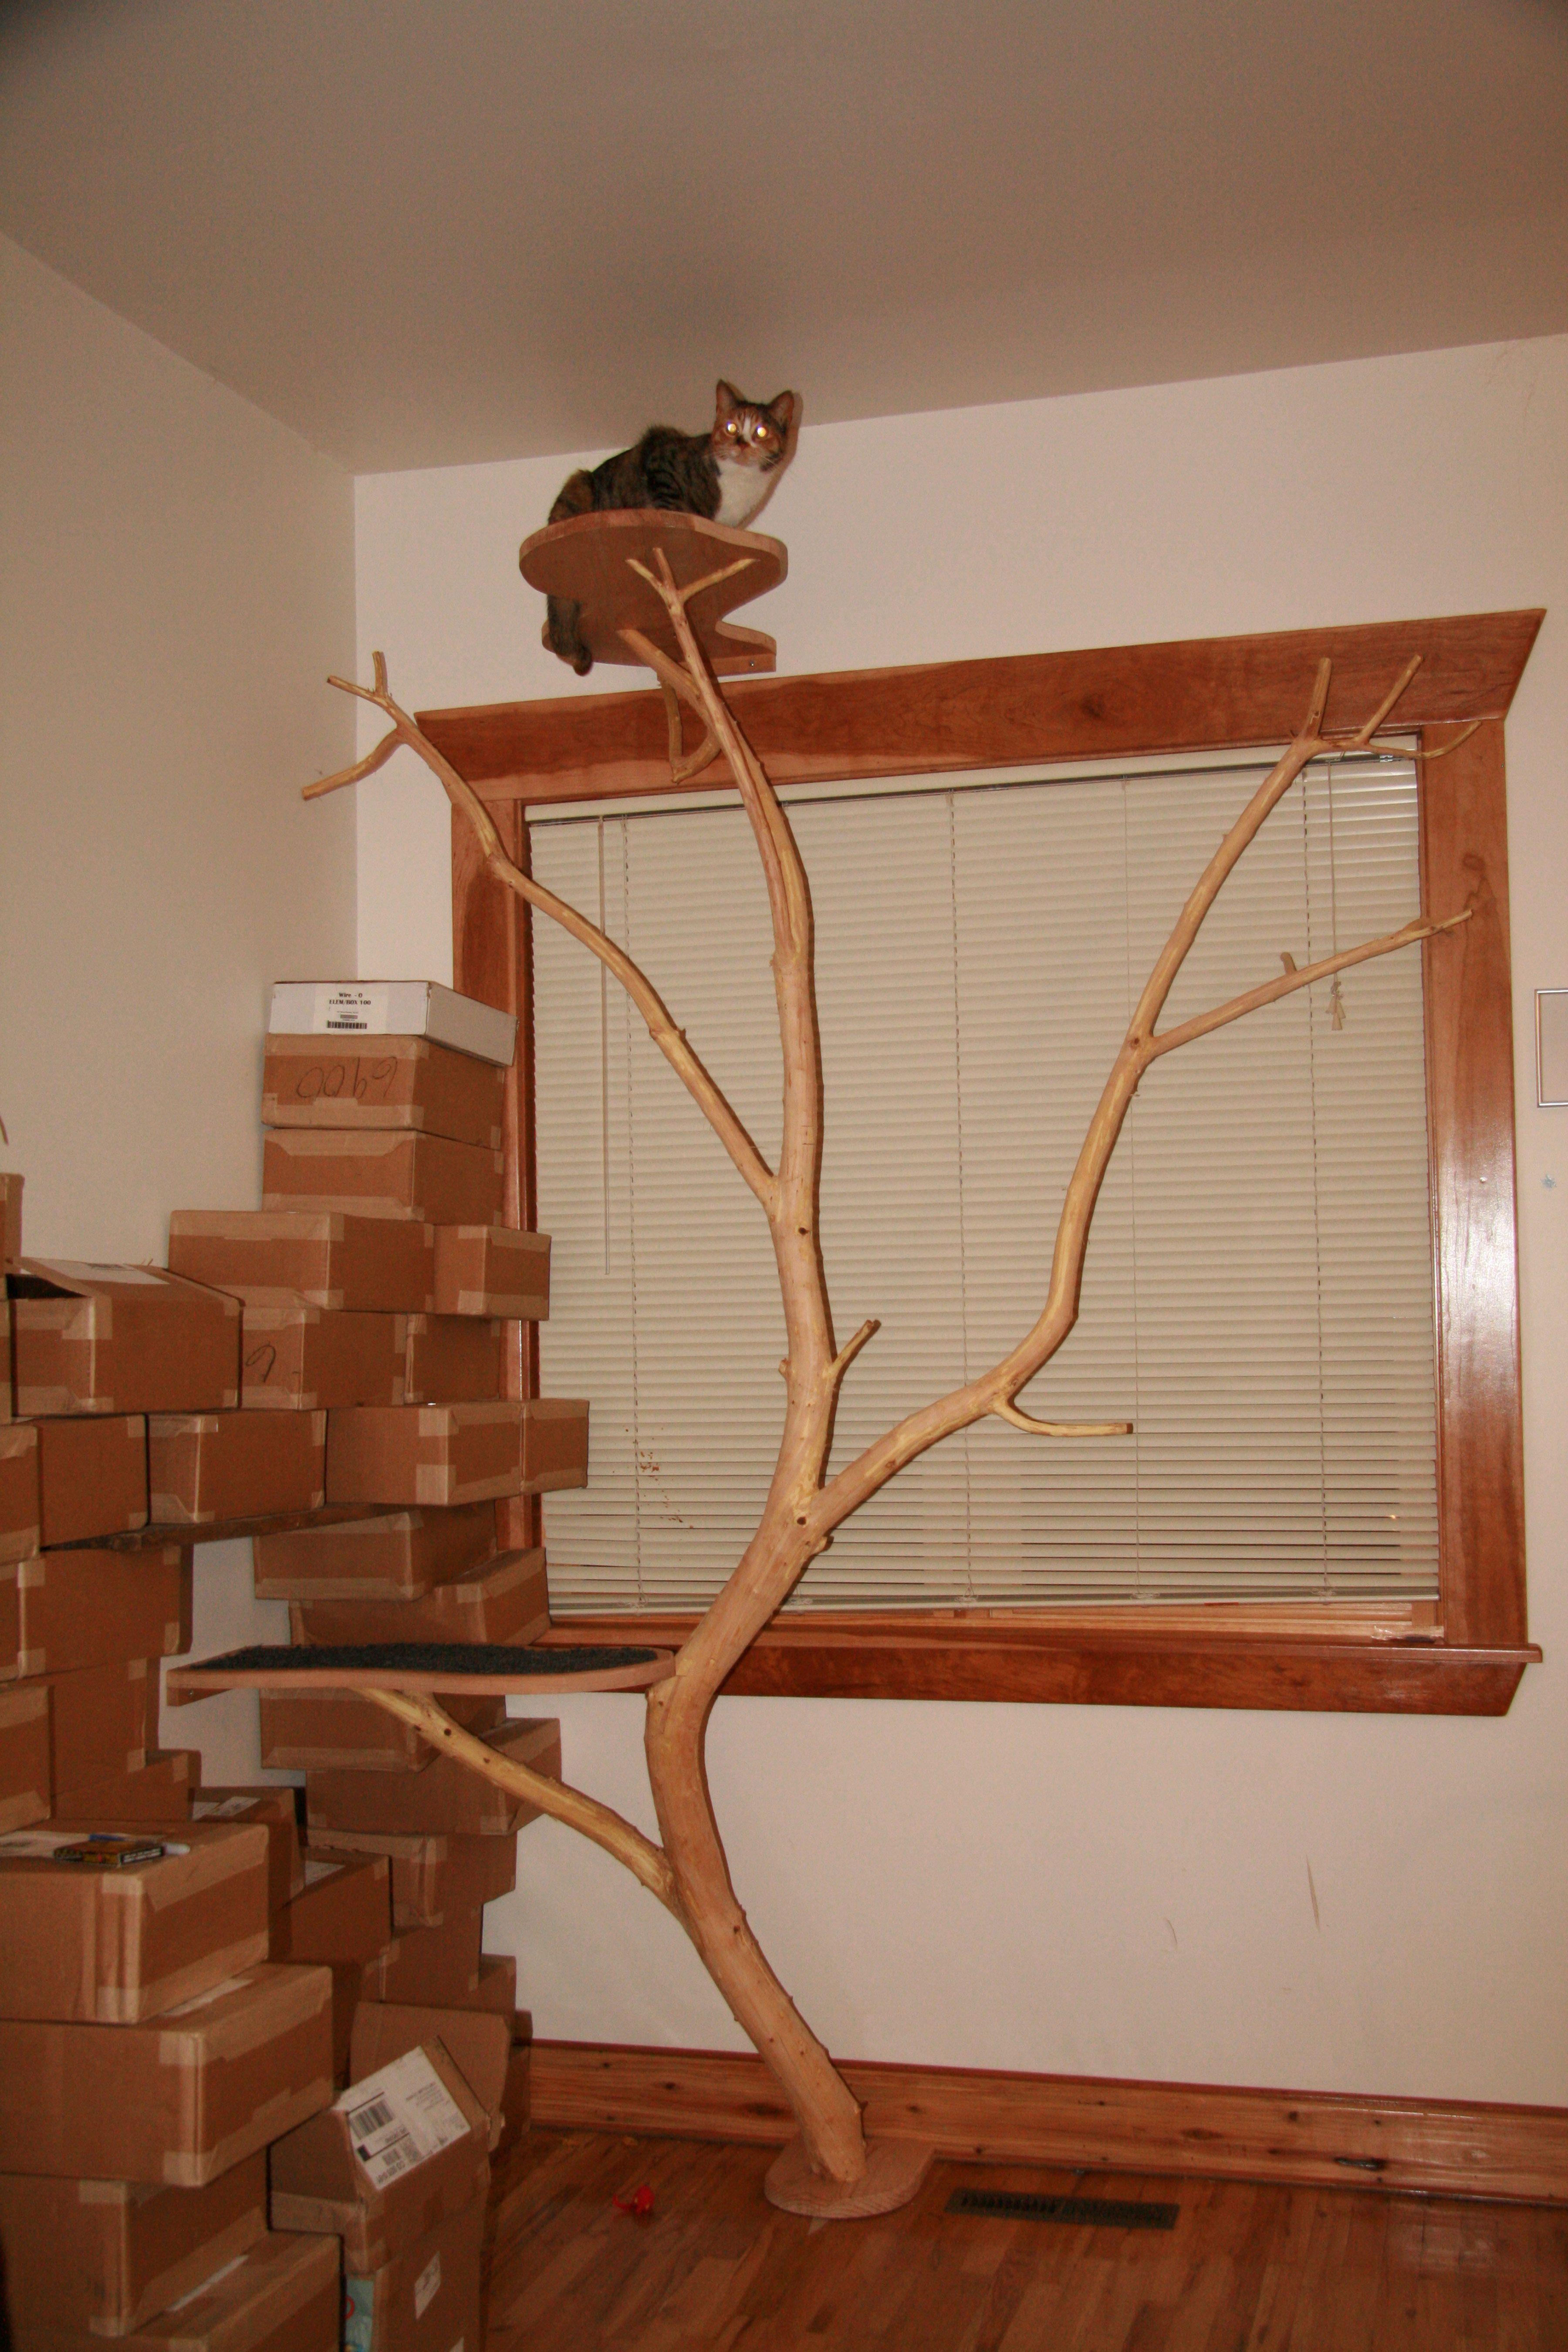 cat tree  clinton l wood  remodel timberwork carpentry  diy  - cat tree  clinton l wood  remodel timberwork carpentry